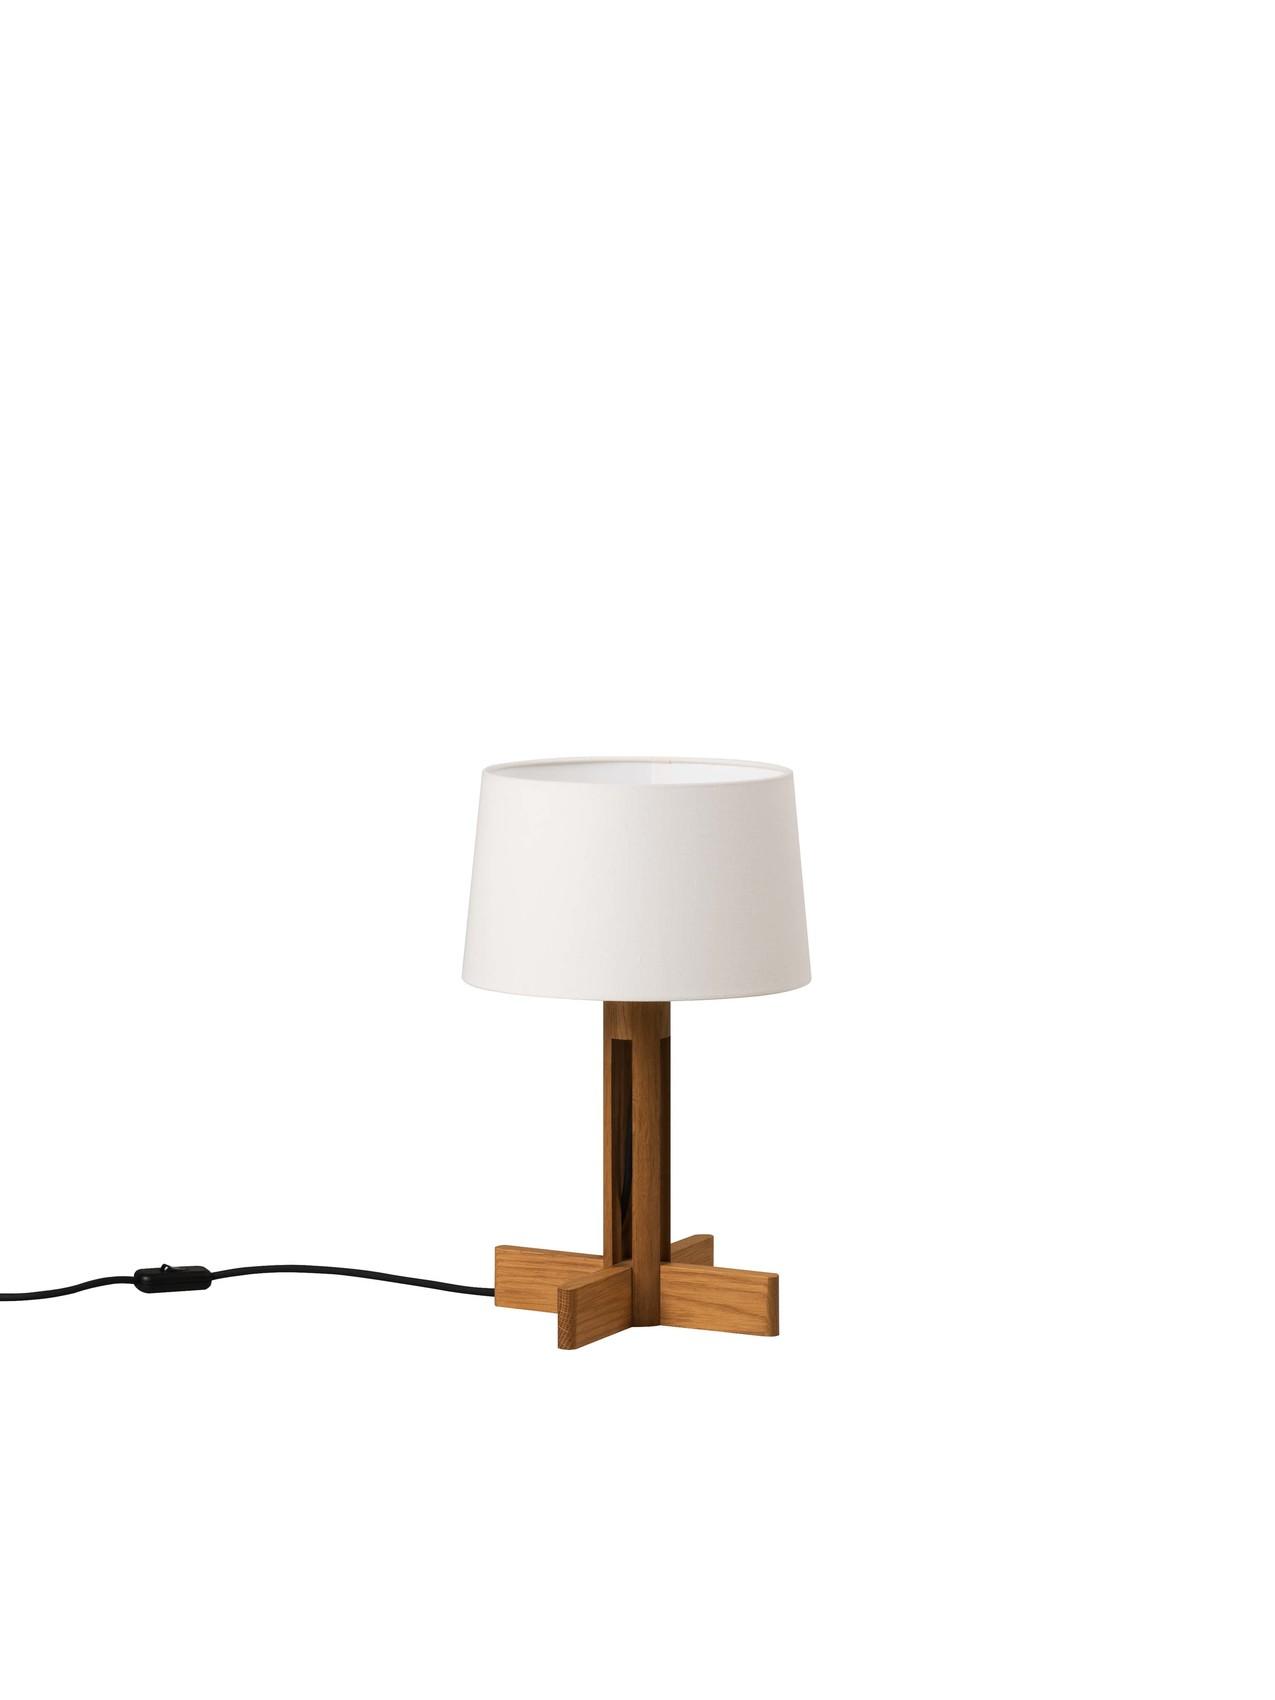 Santa & Cole FAD Menor table lamp